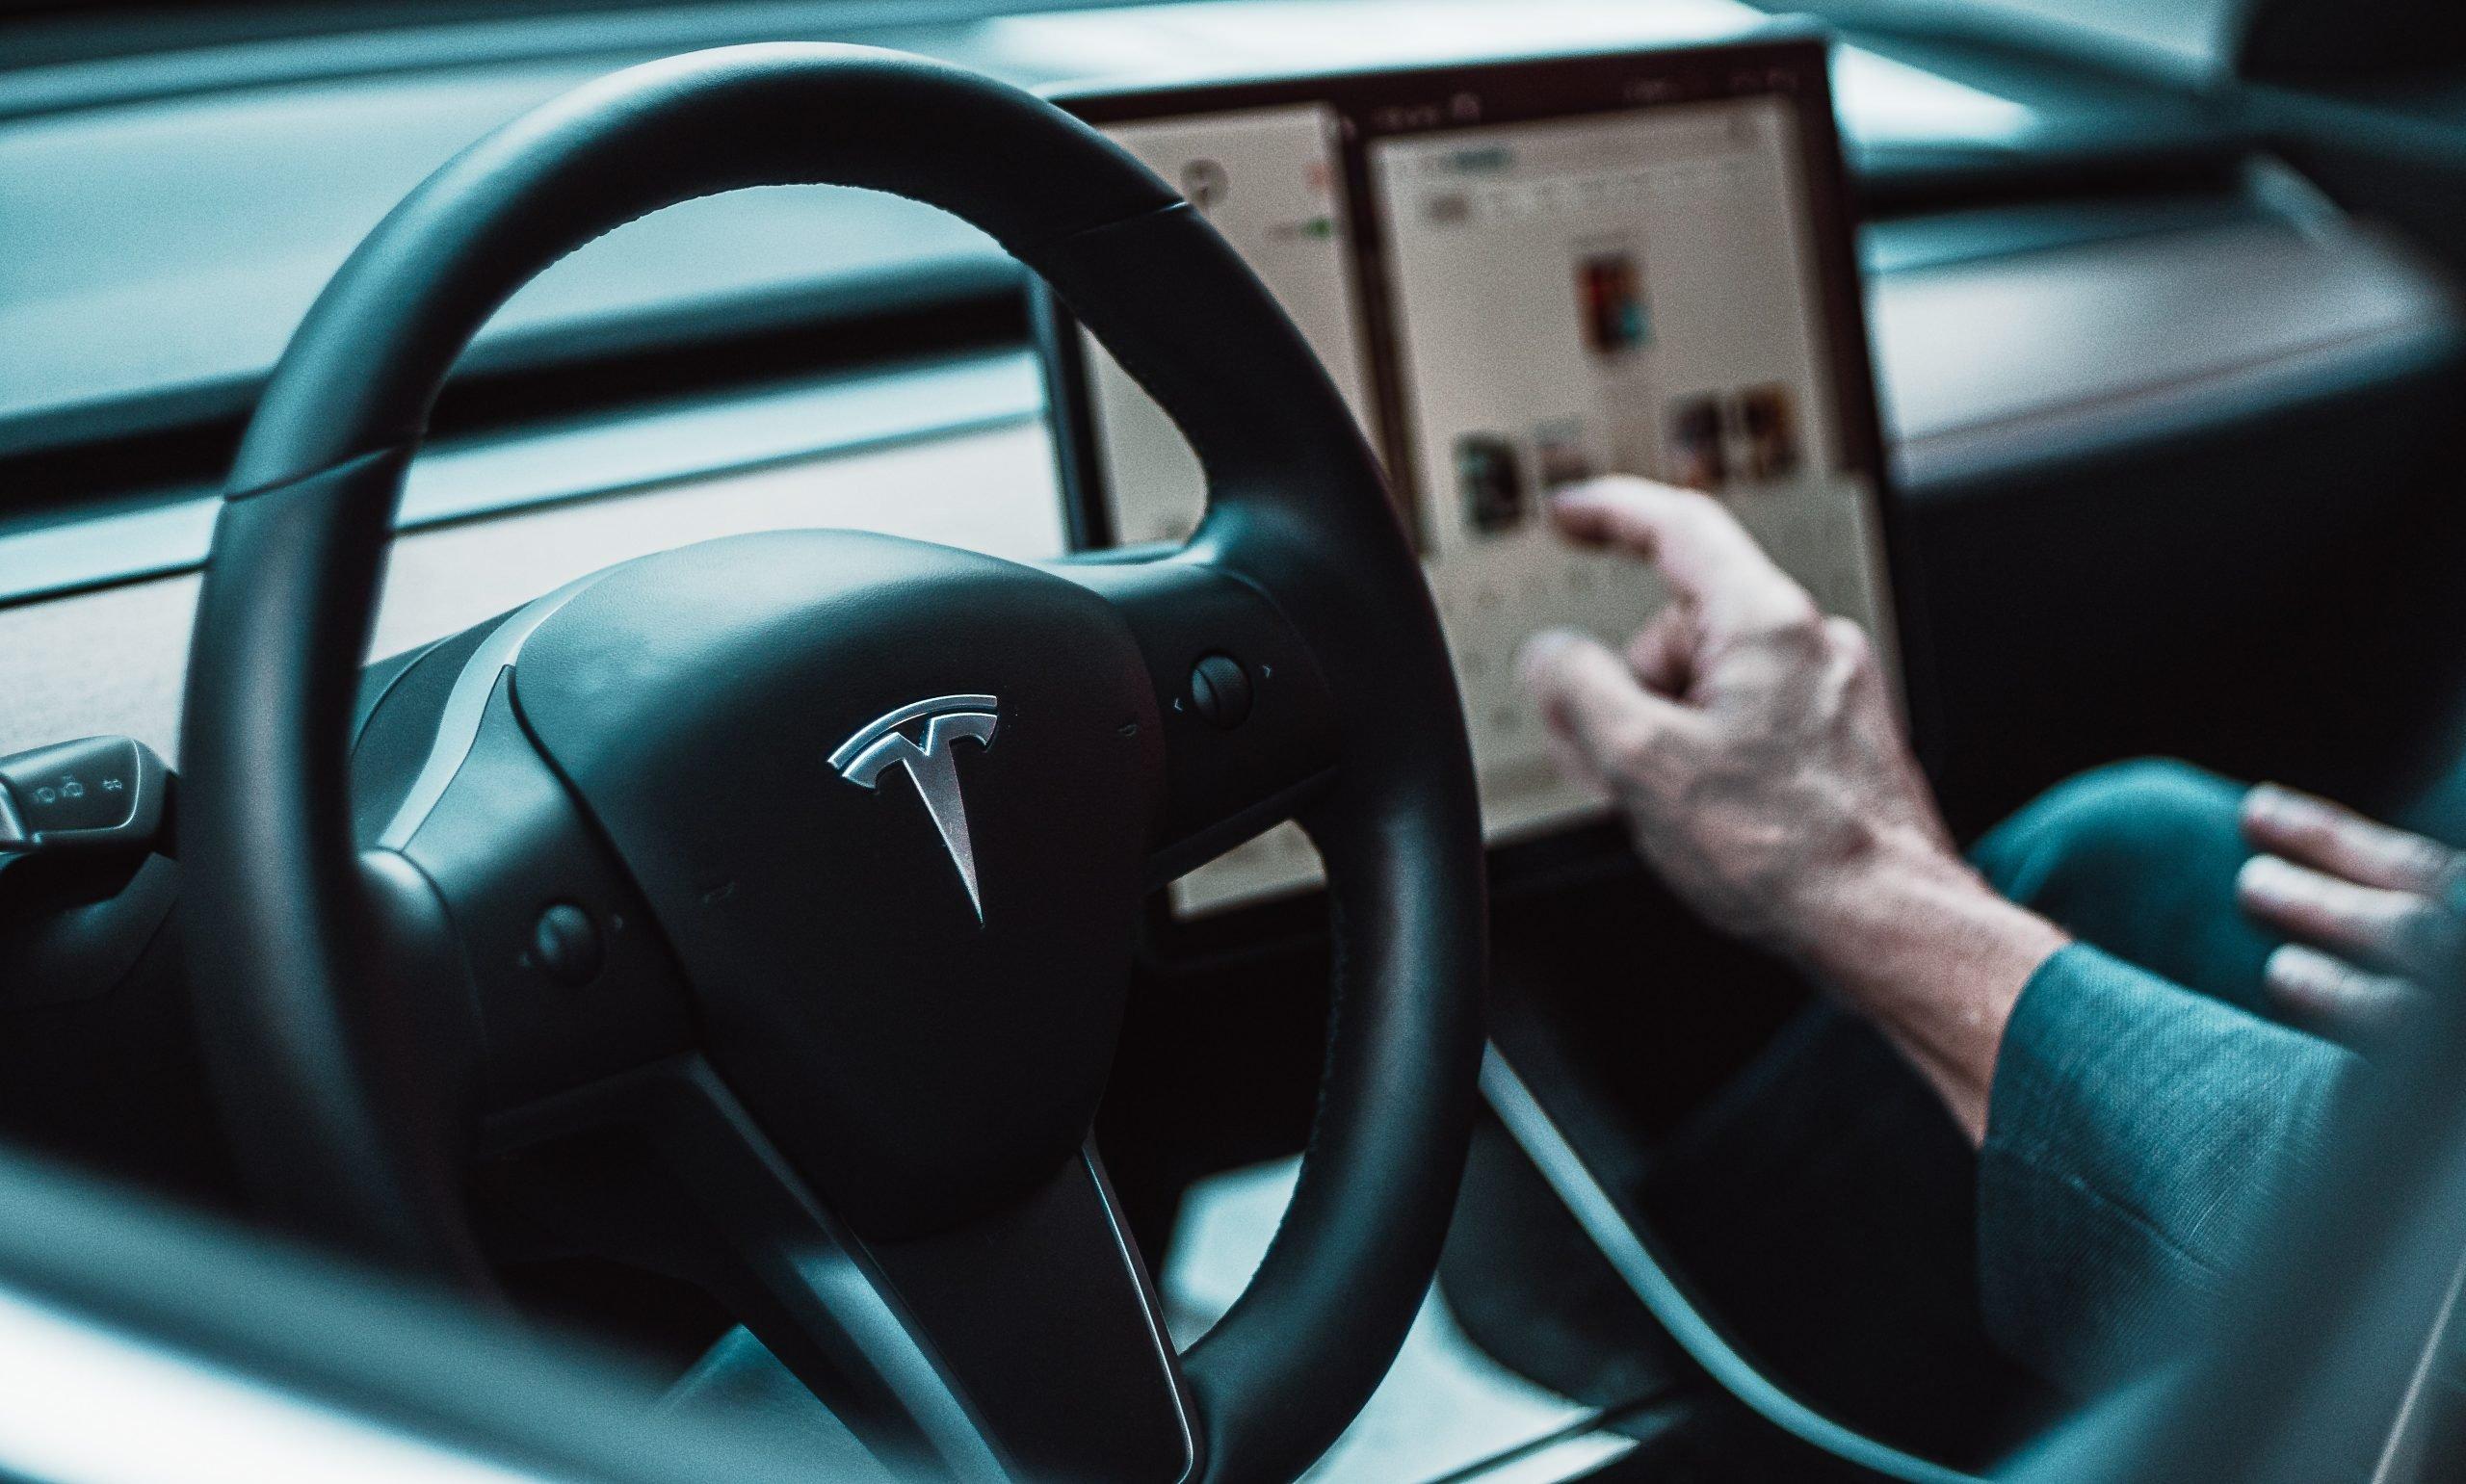 Limitless EV - Electric Vehicle Ownership in Kelowna and Okanagan Valley